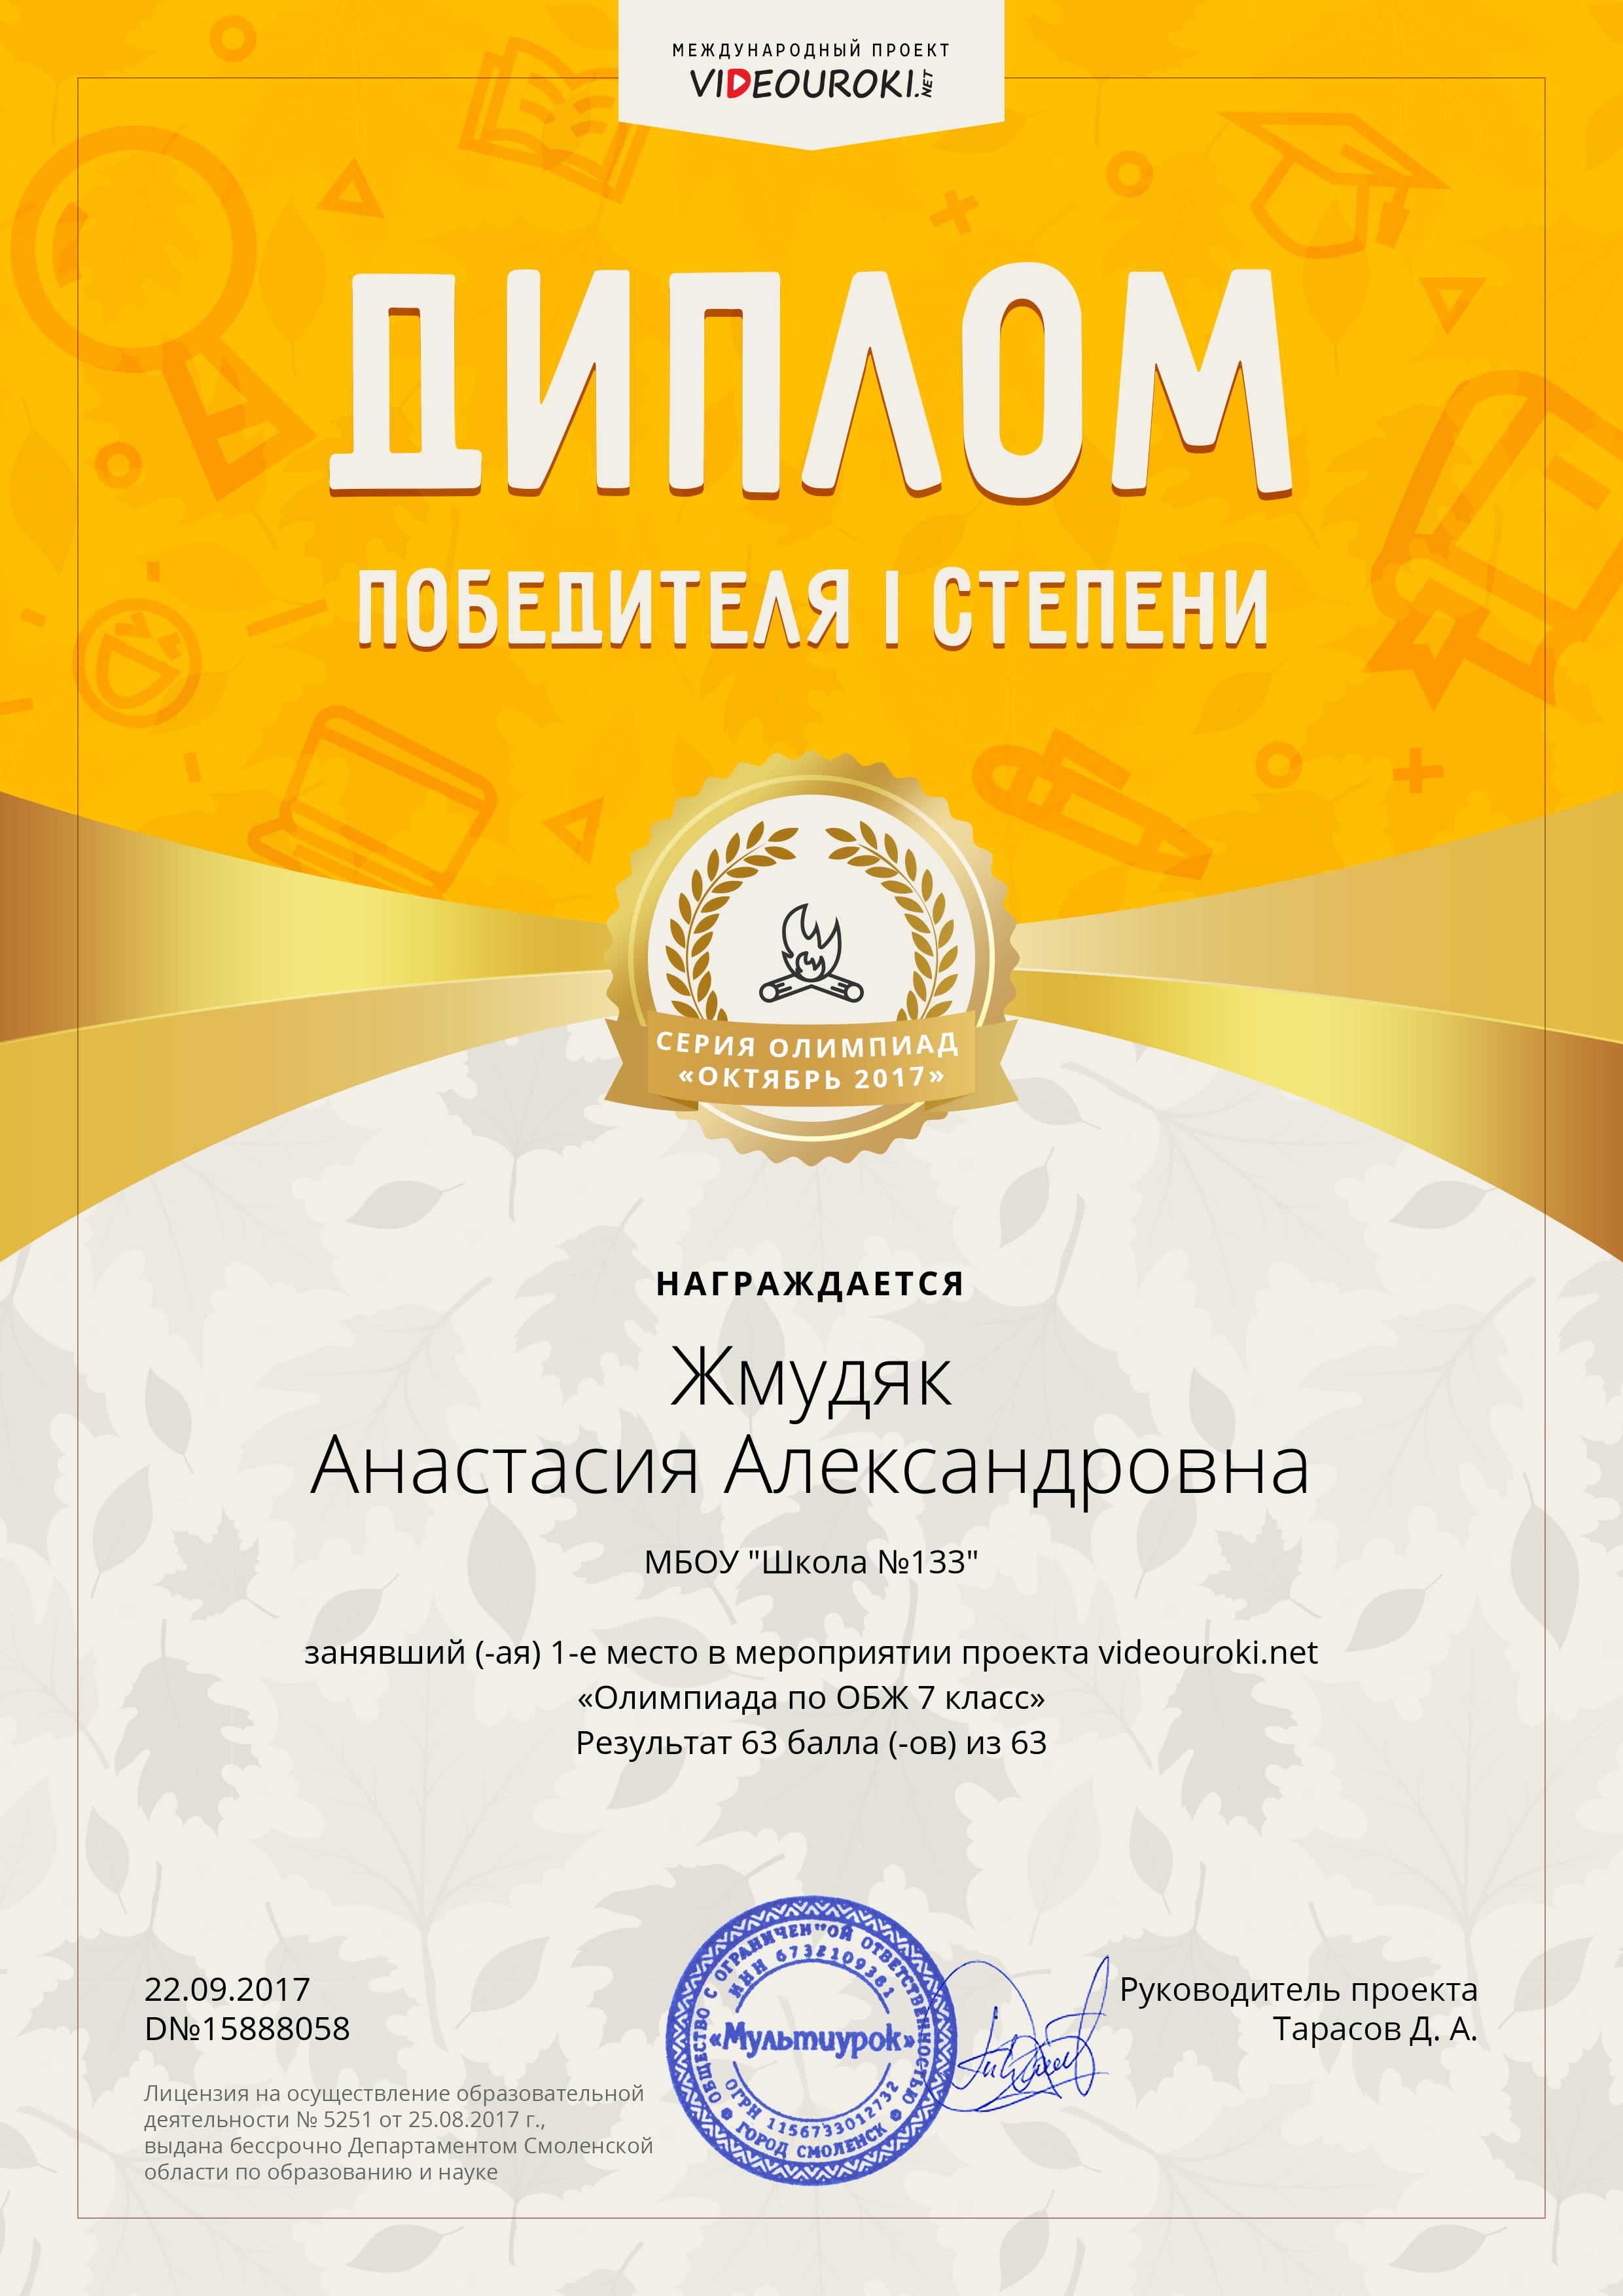 33791917. 15888058-Жмудяк Анастасия Александровна.png